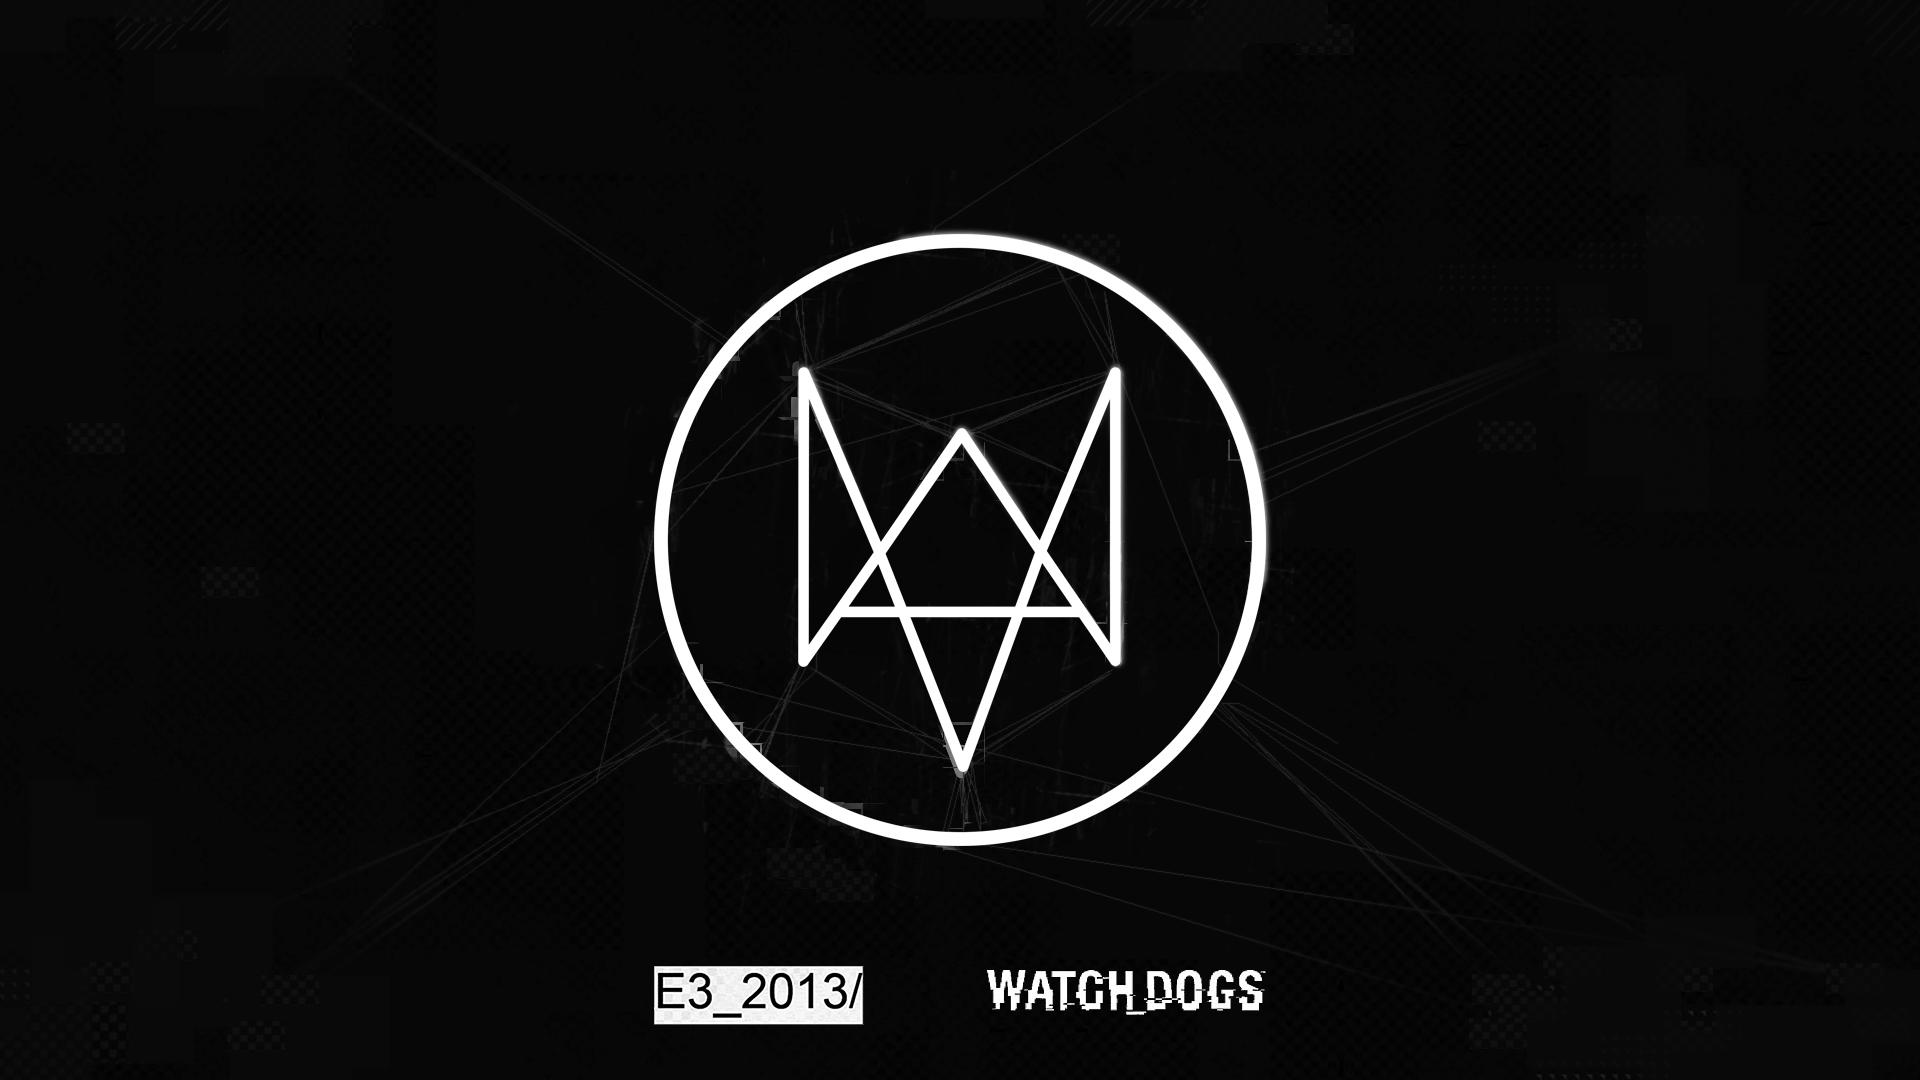 wallpapers watch fox logo watchdogs 1920x1080